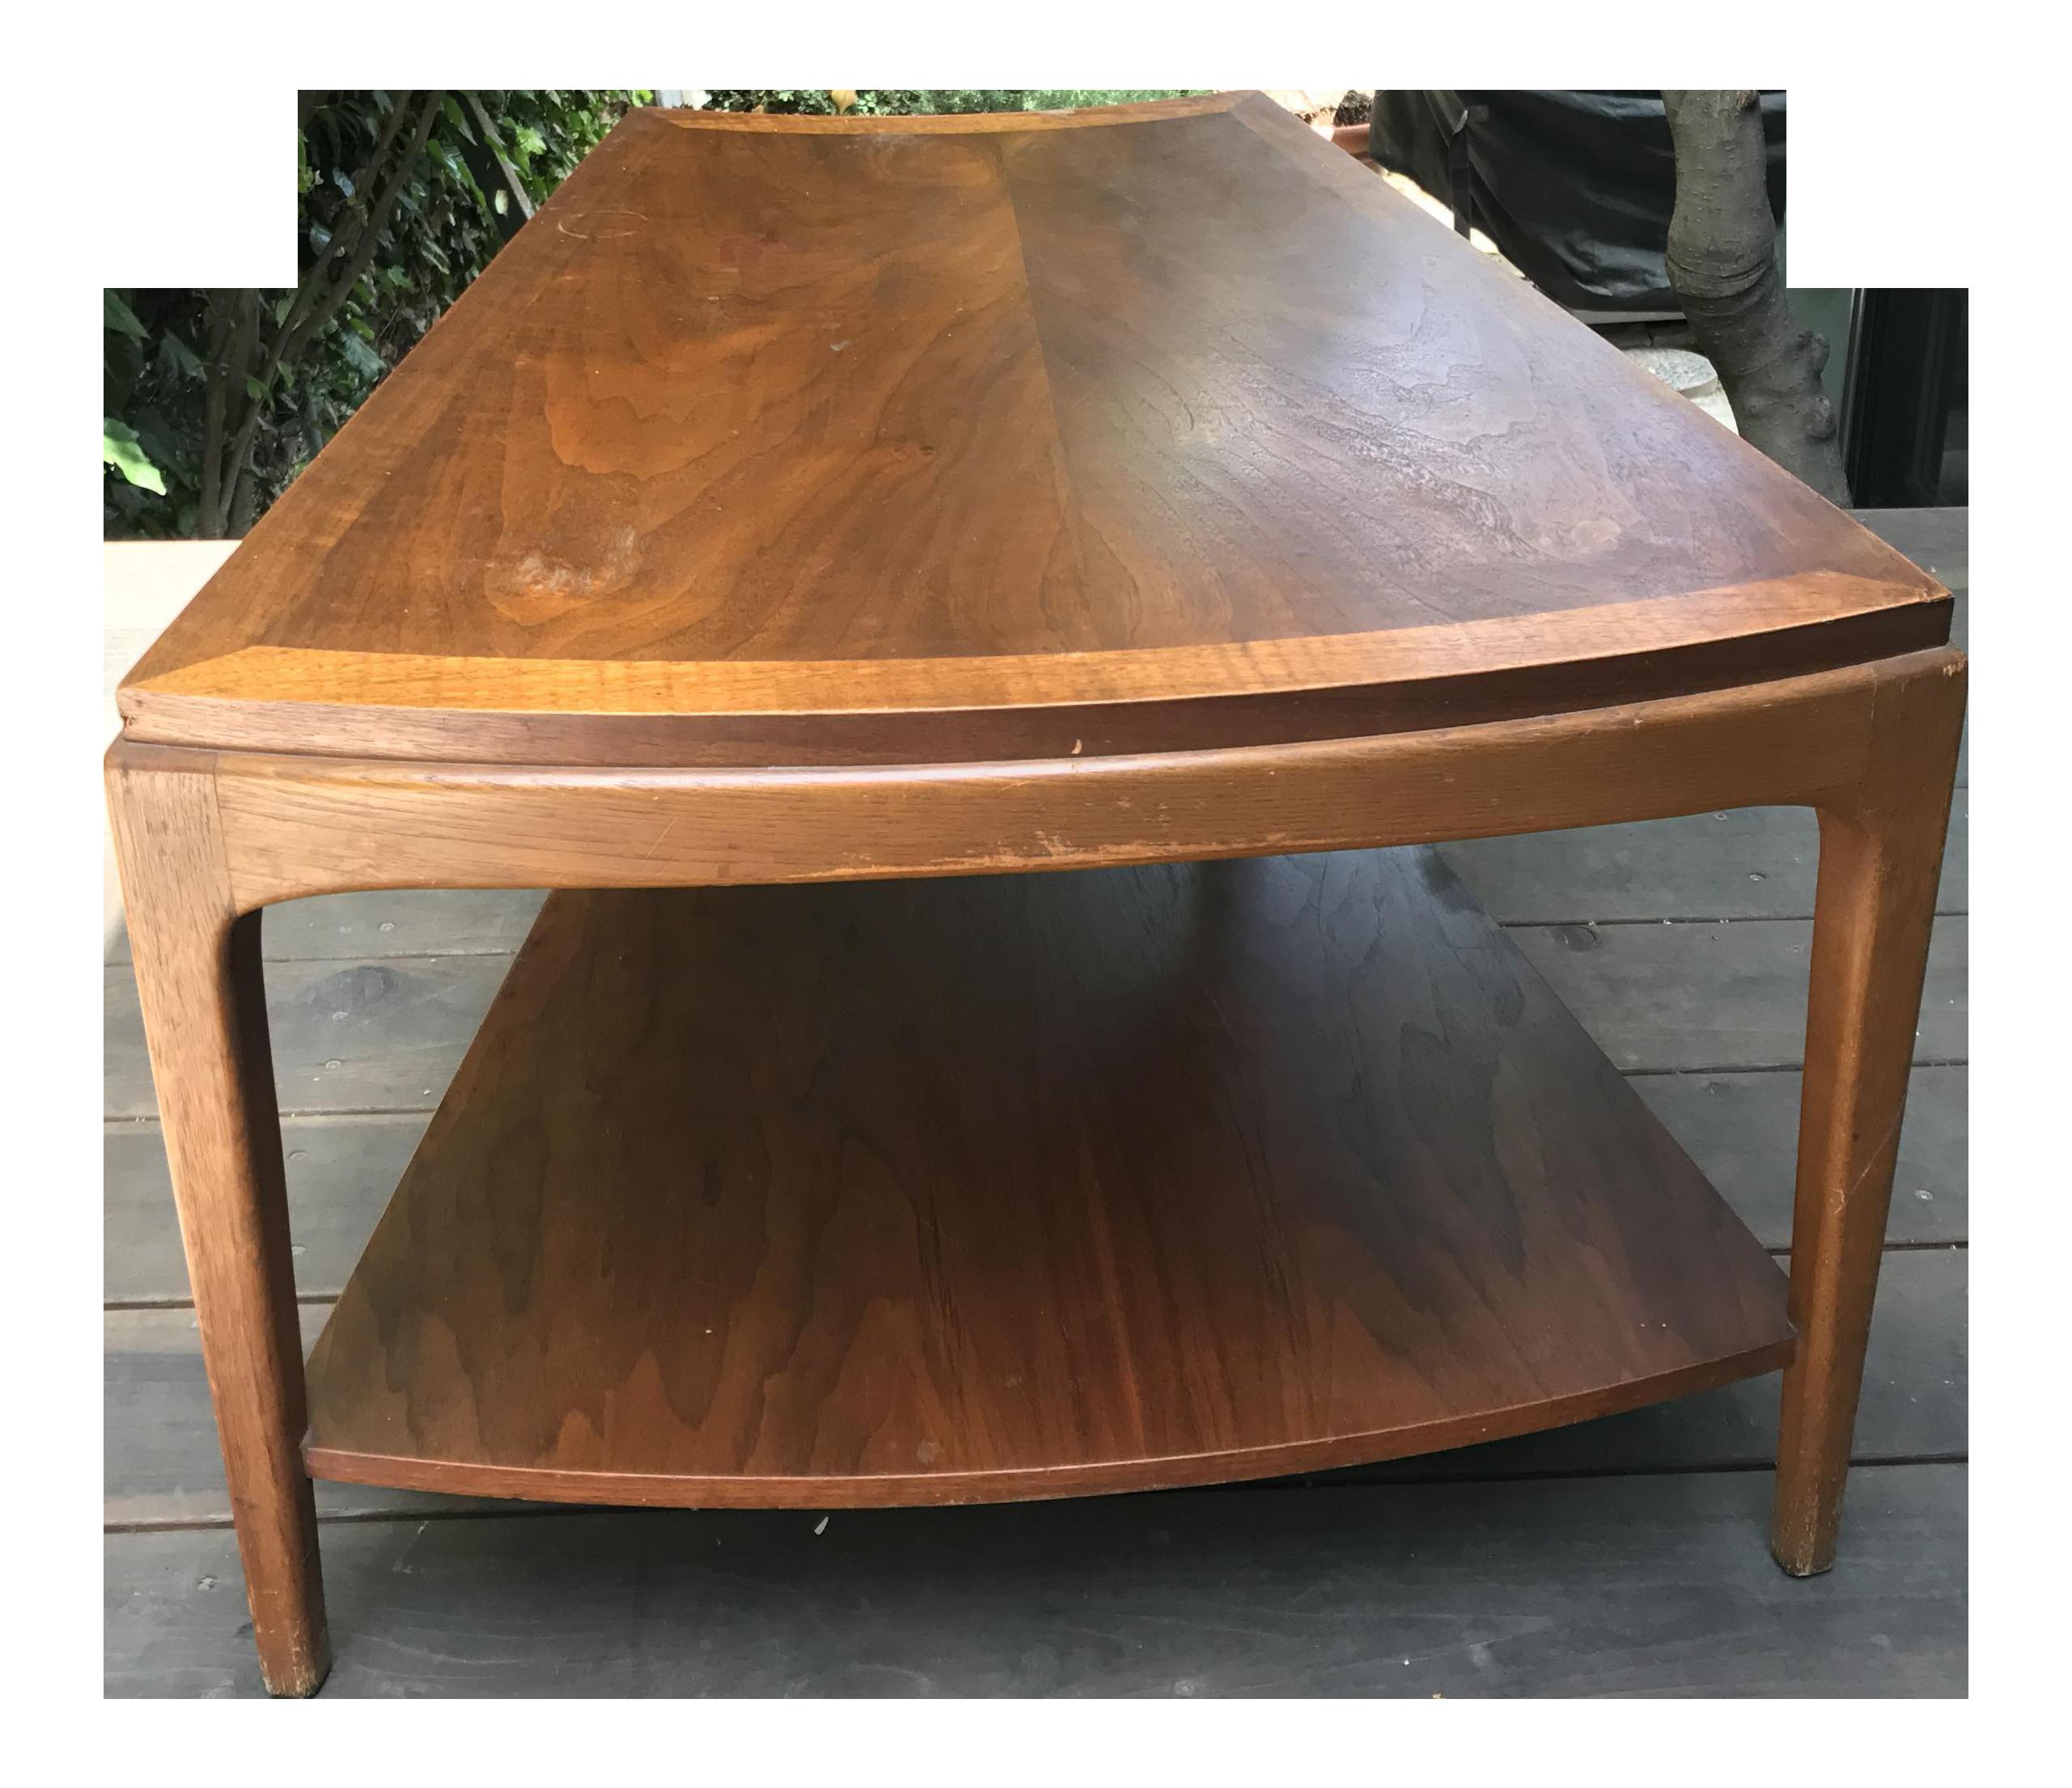 Modern Furniture Side Table vintage & used lane furniture side tables | chairish